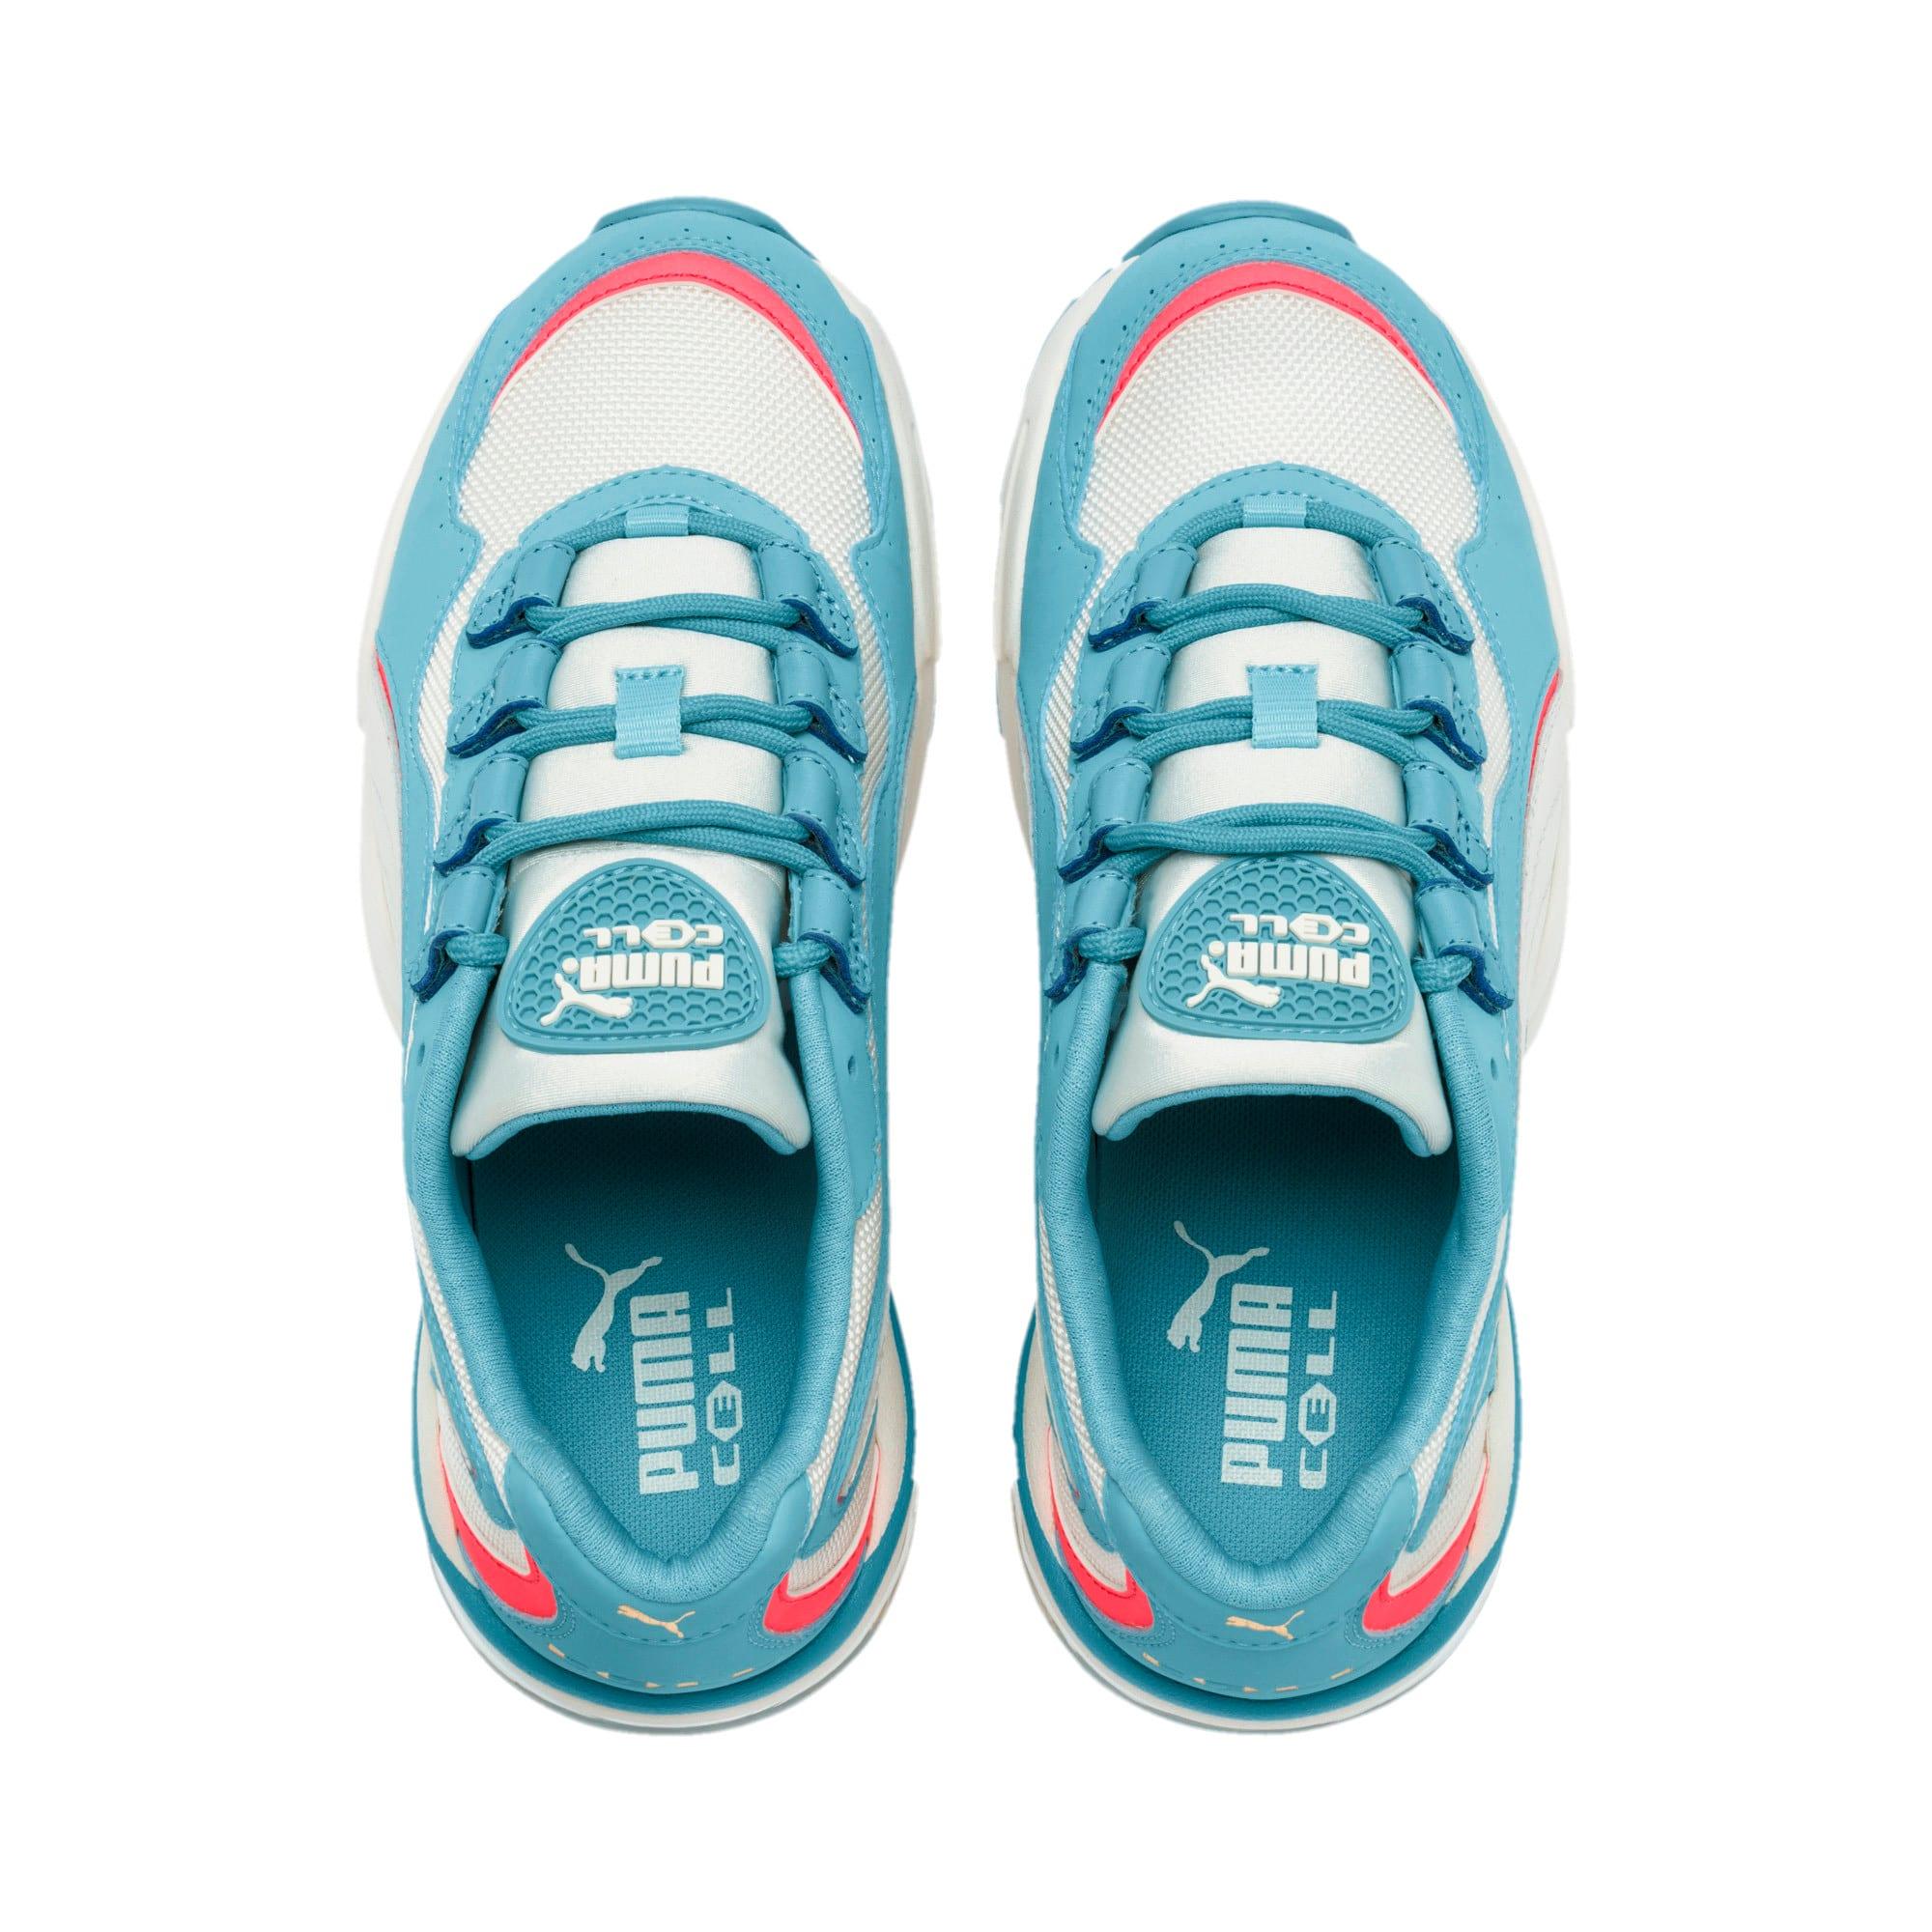 Thumbnail 7 of CELL Stellar Damen Sneaker, Milky Blue-Puma Team Gold, medium